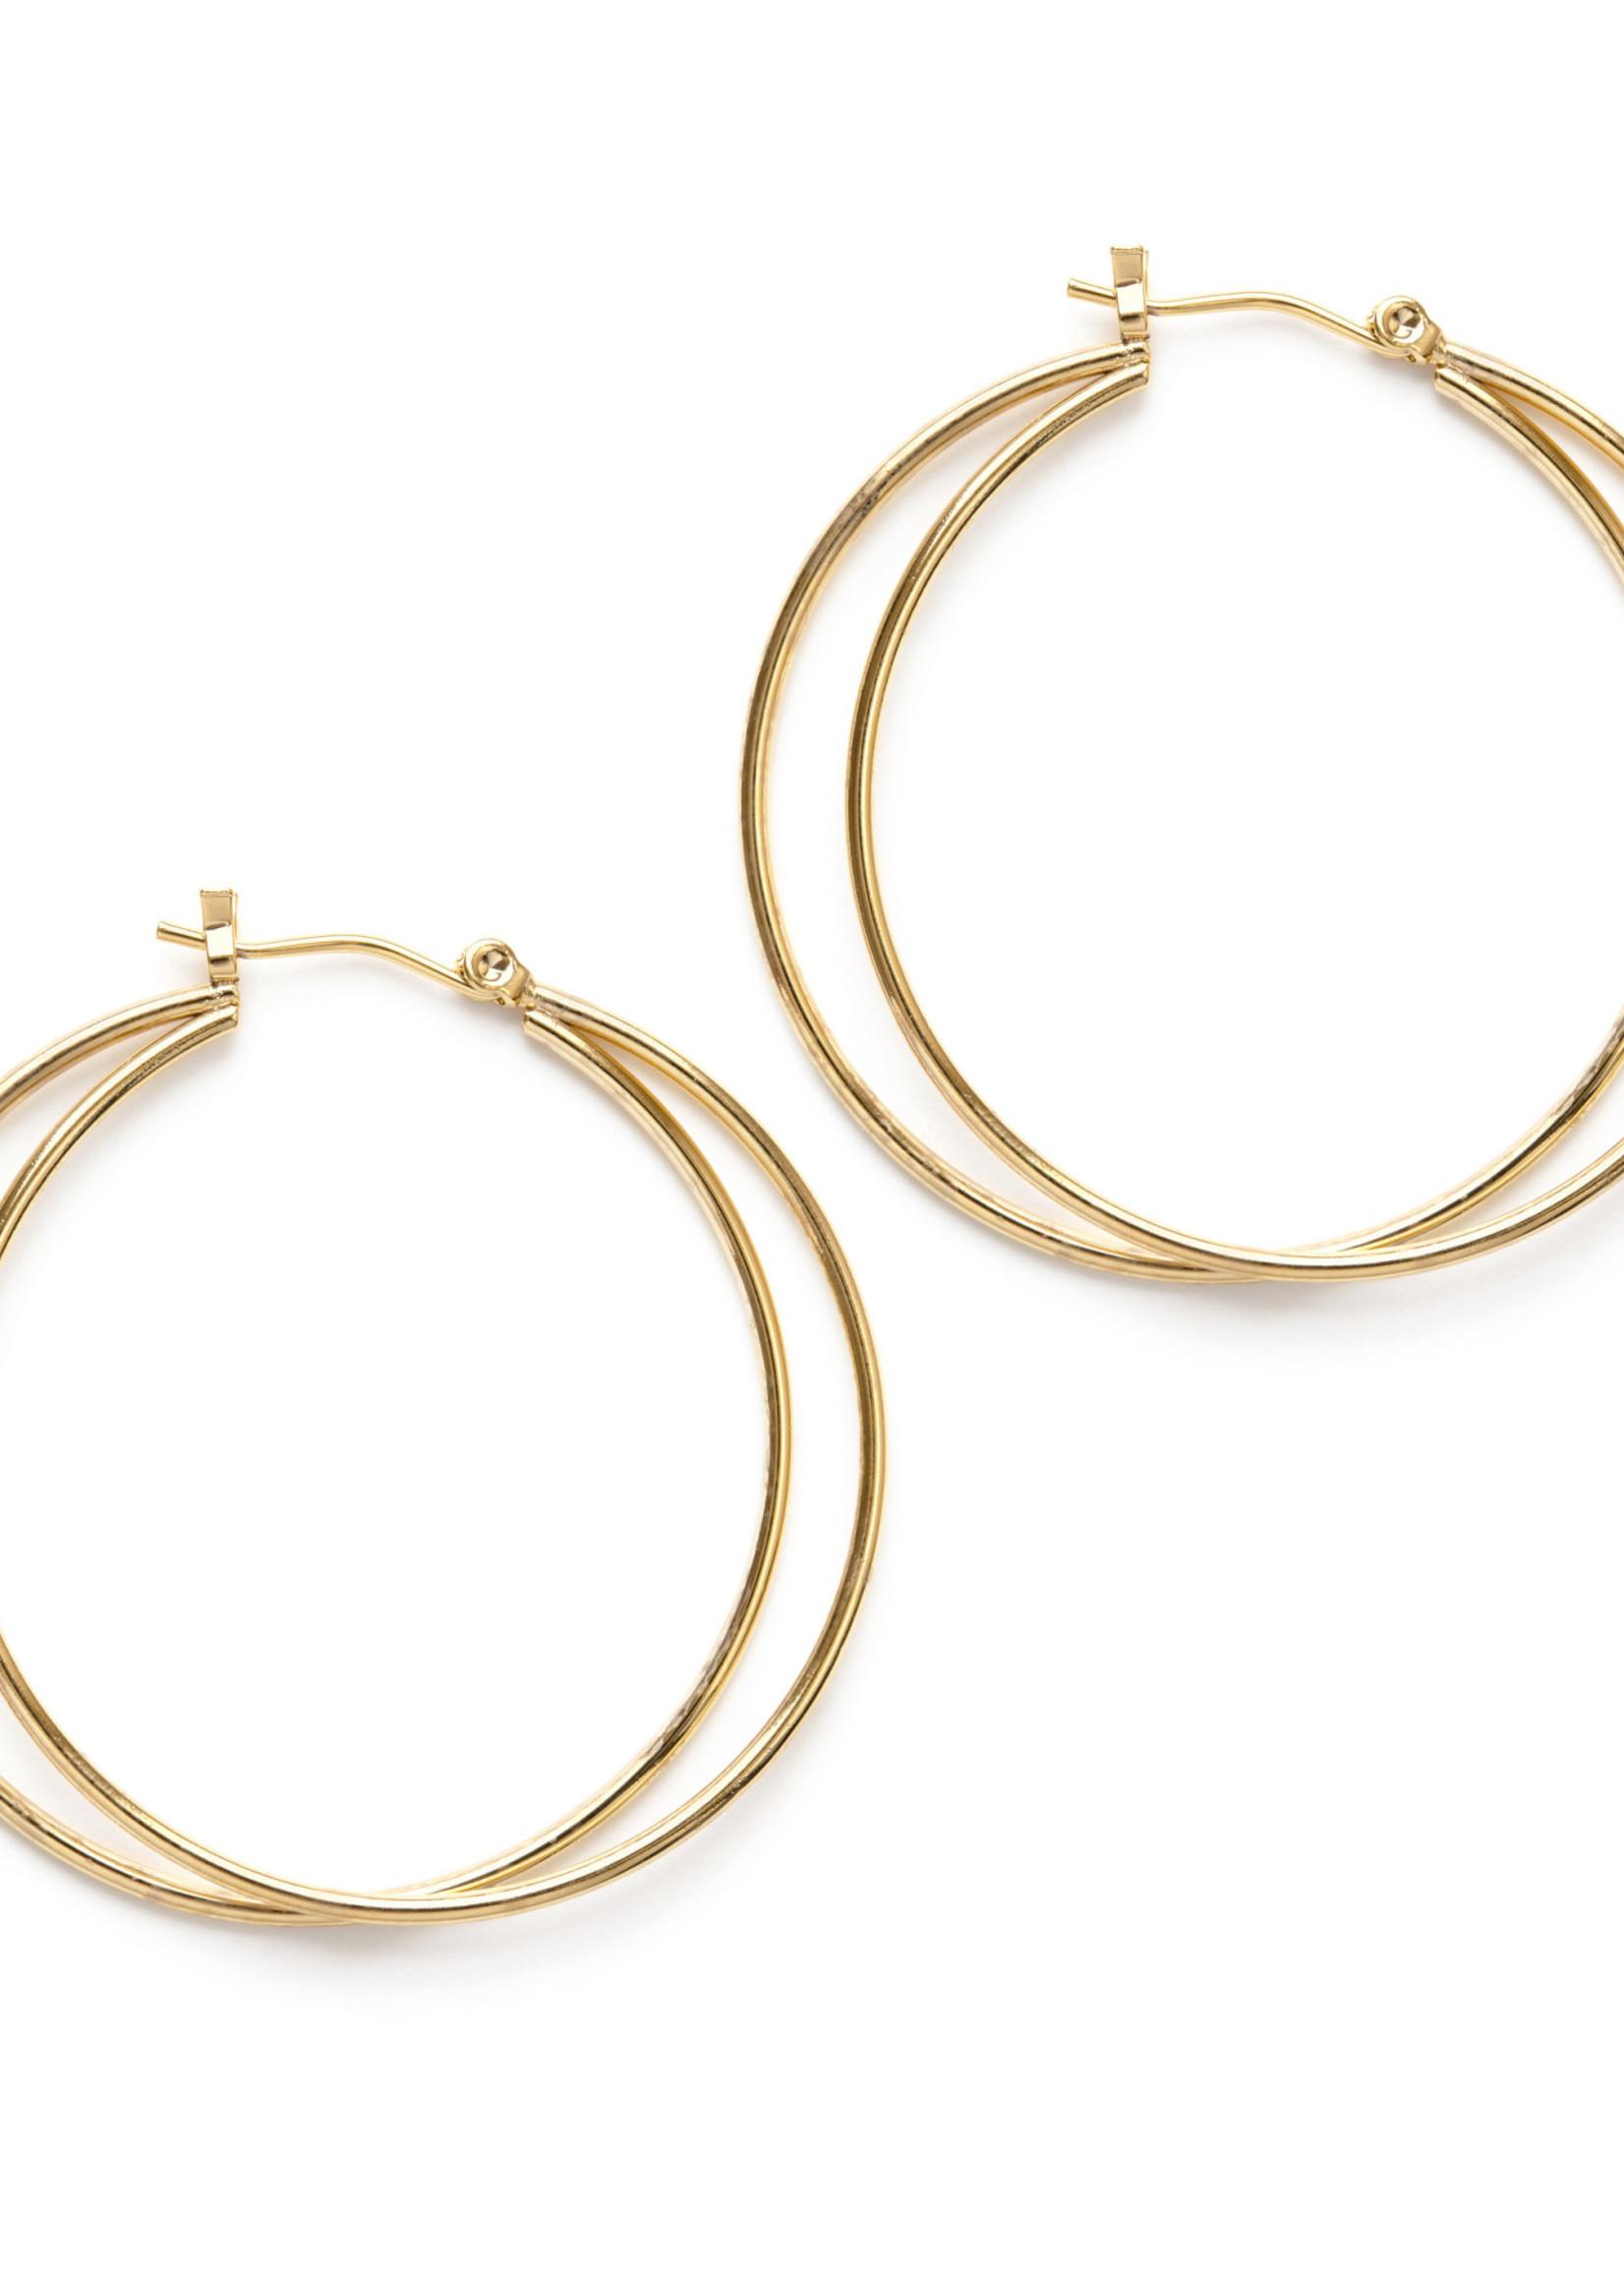 gold double circle hoop earrings ECLIPSE GOLD EARRINGS